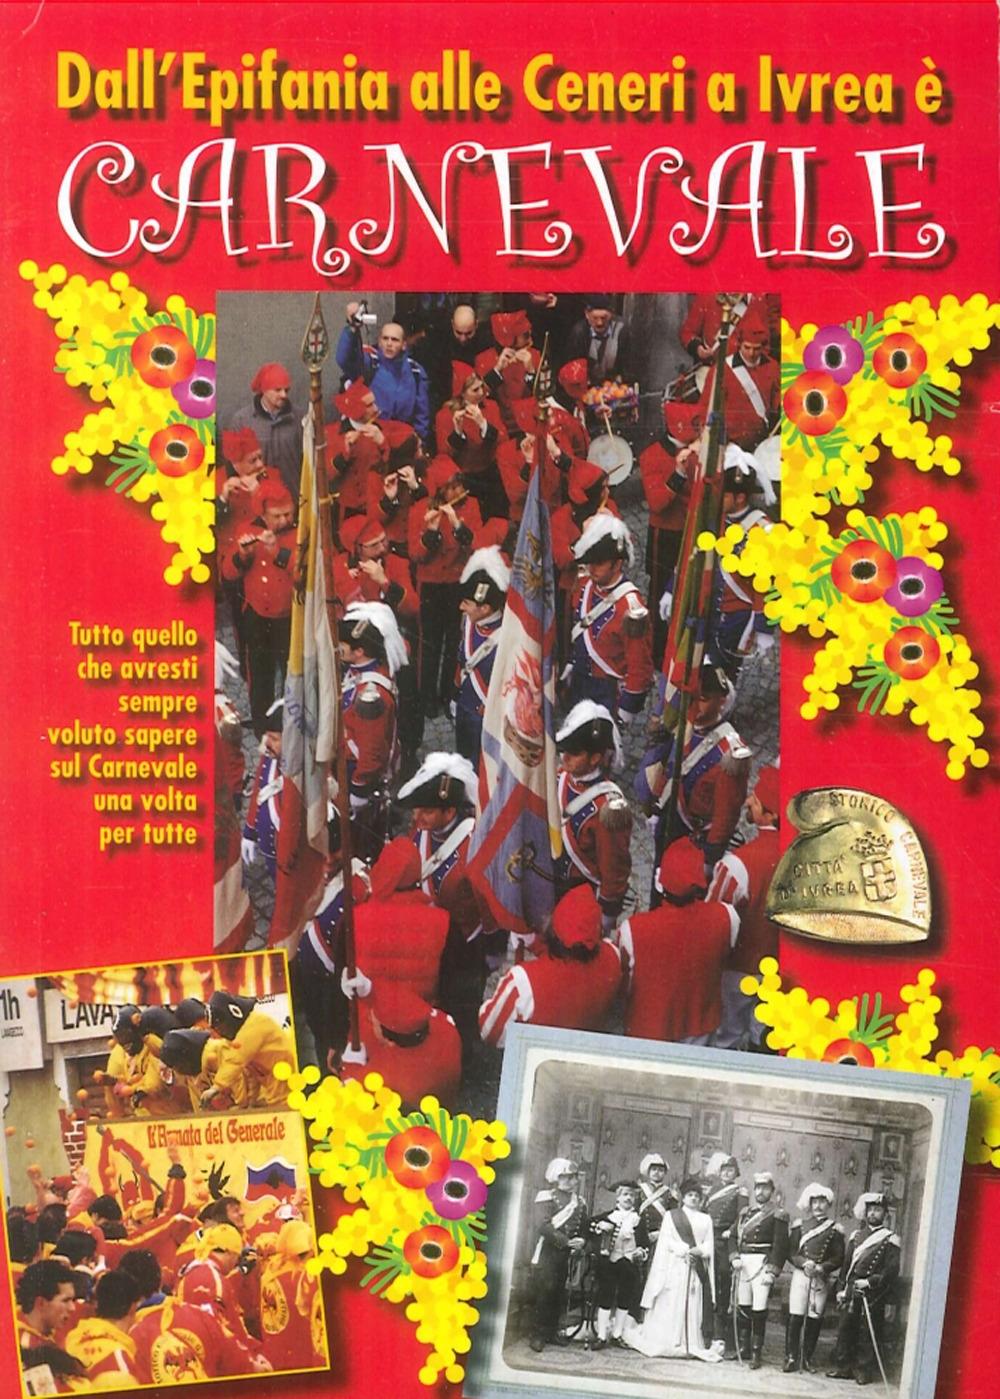 Dall'Epifania alle Ceneri a Ivrea è Carnevale